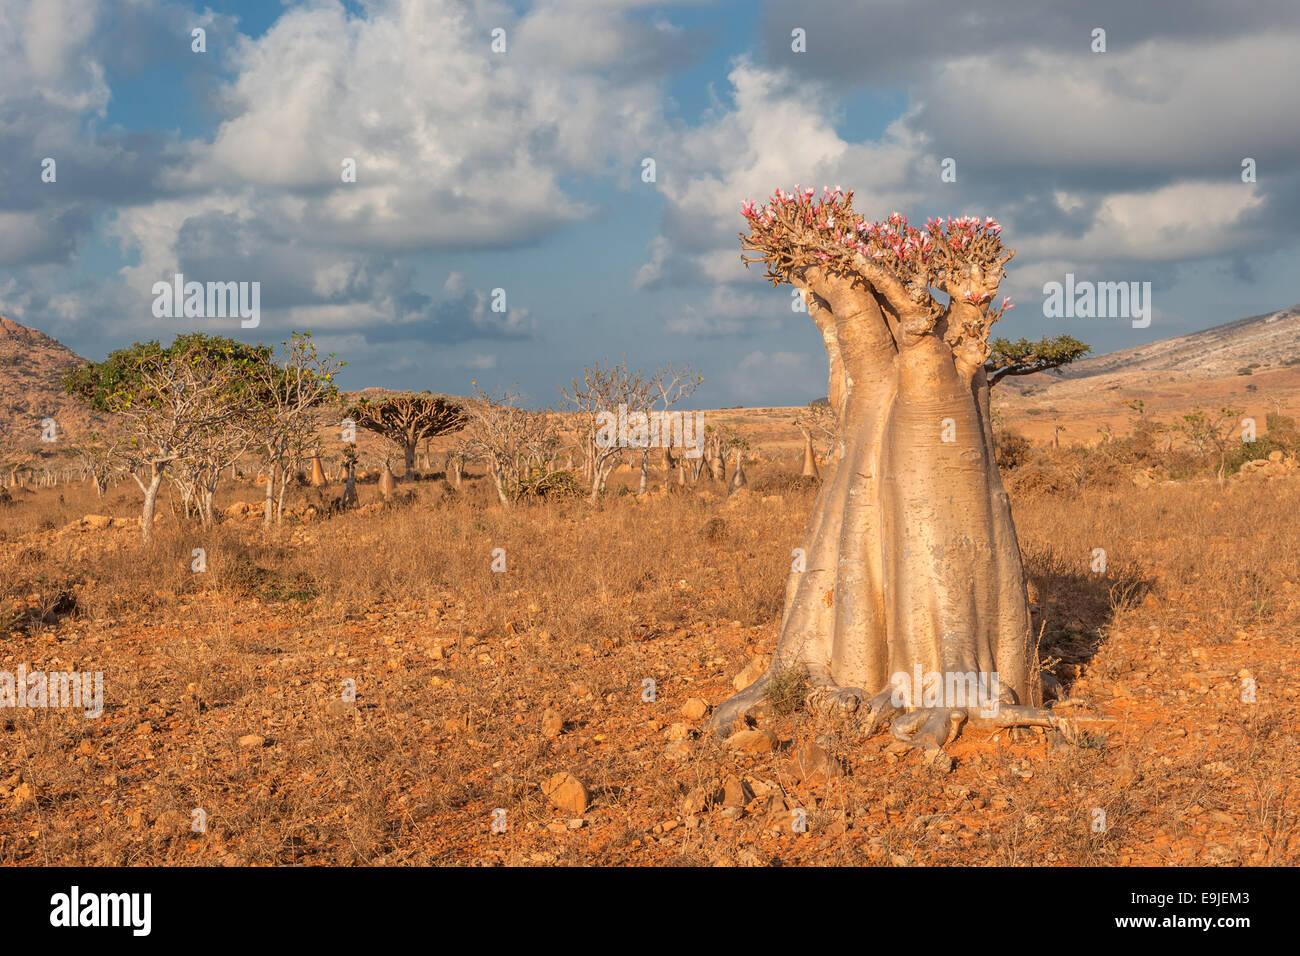 Desert rose tree, Socotra Island, Yemen - Stock Image